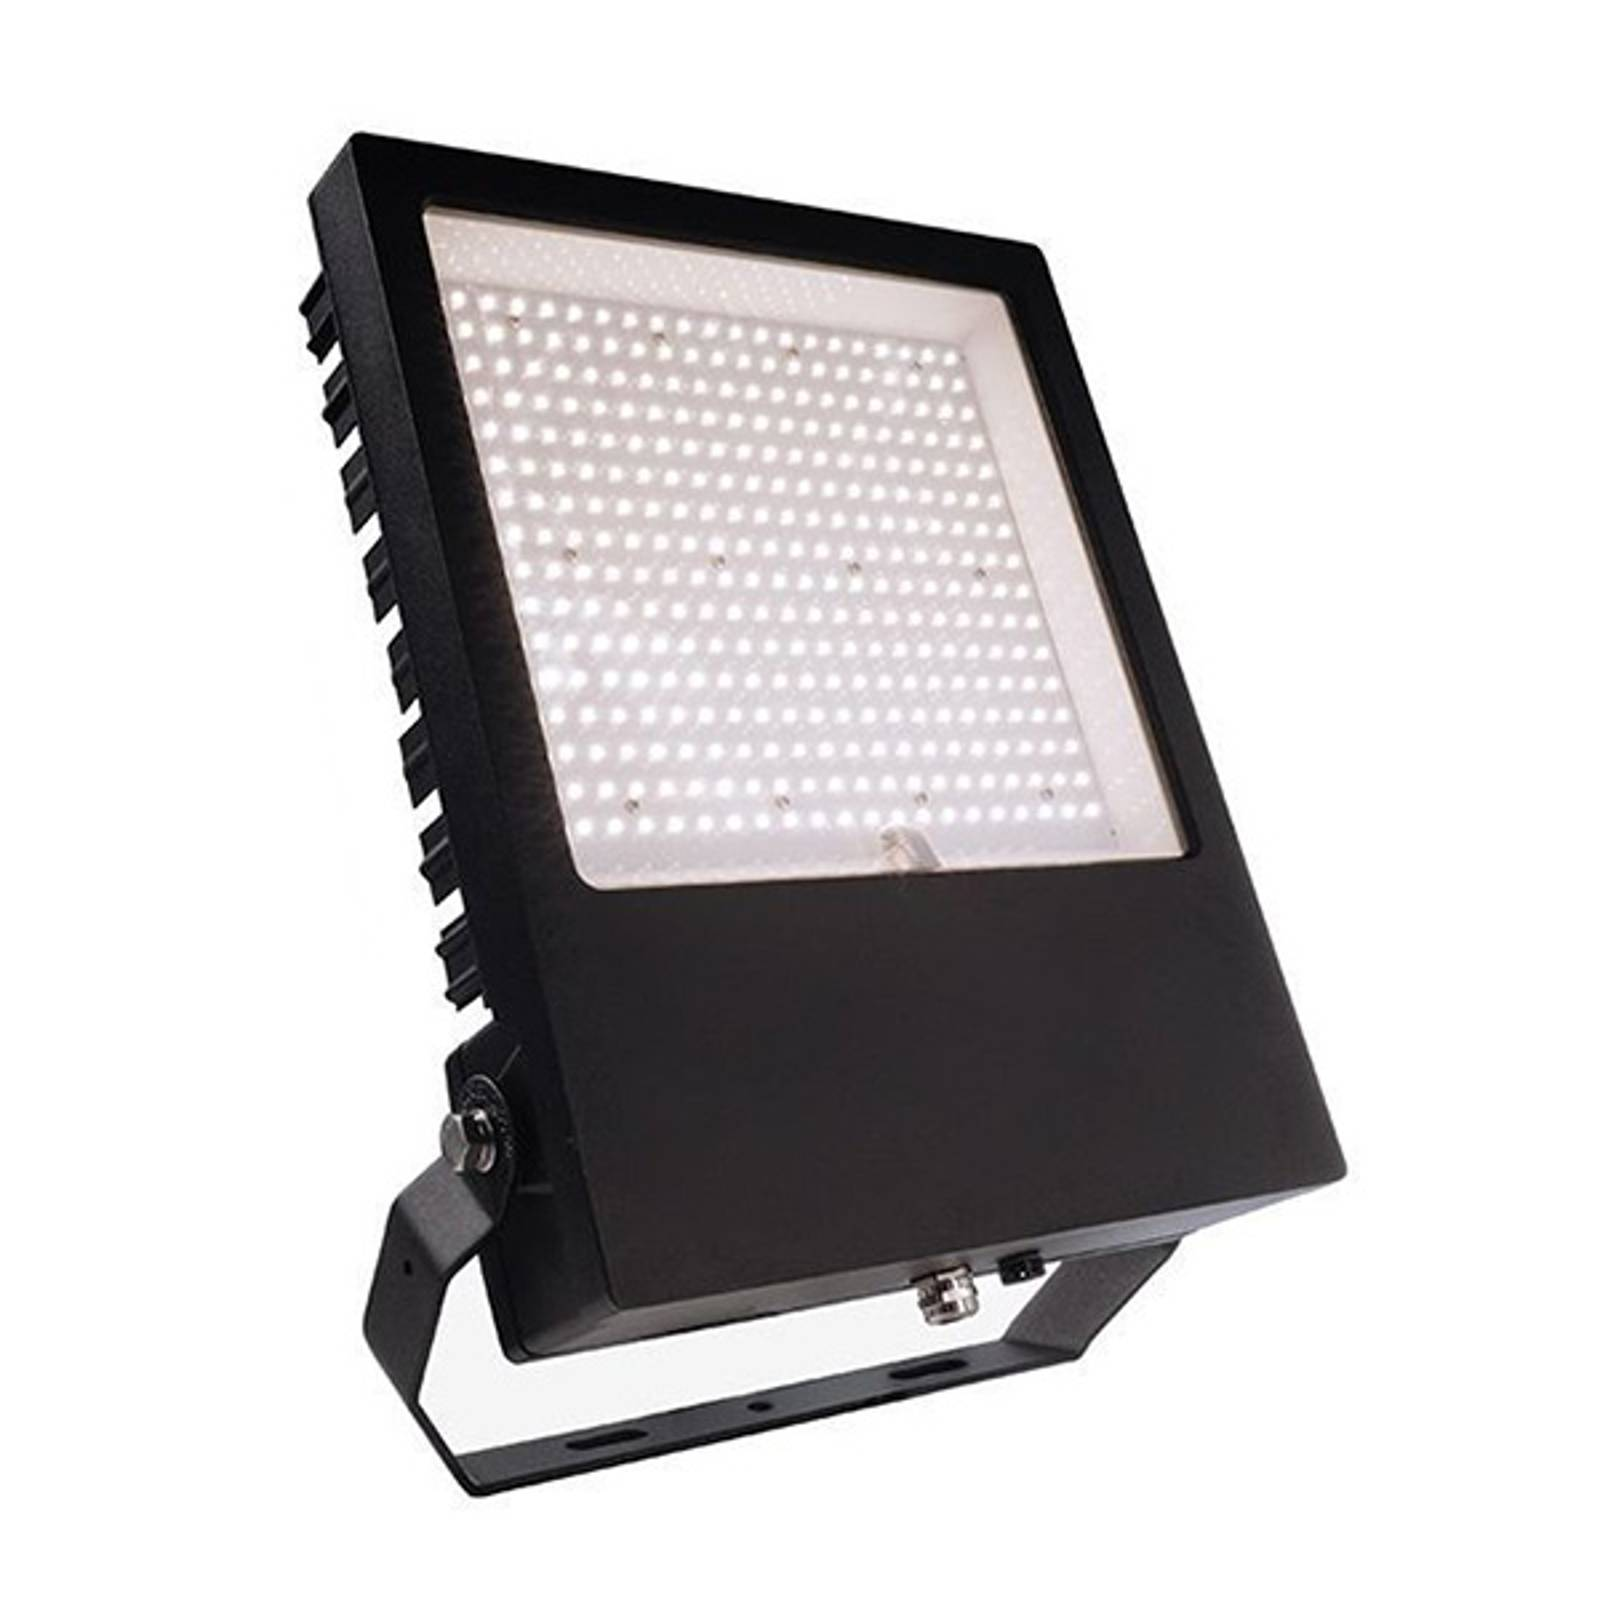 LED-ulkokohdevalaisin Atik, 300 W, 4 000 K